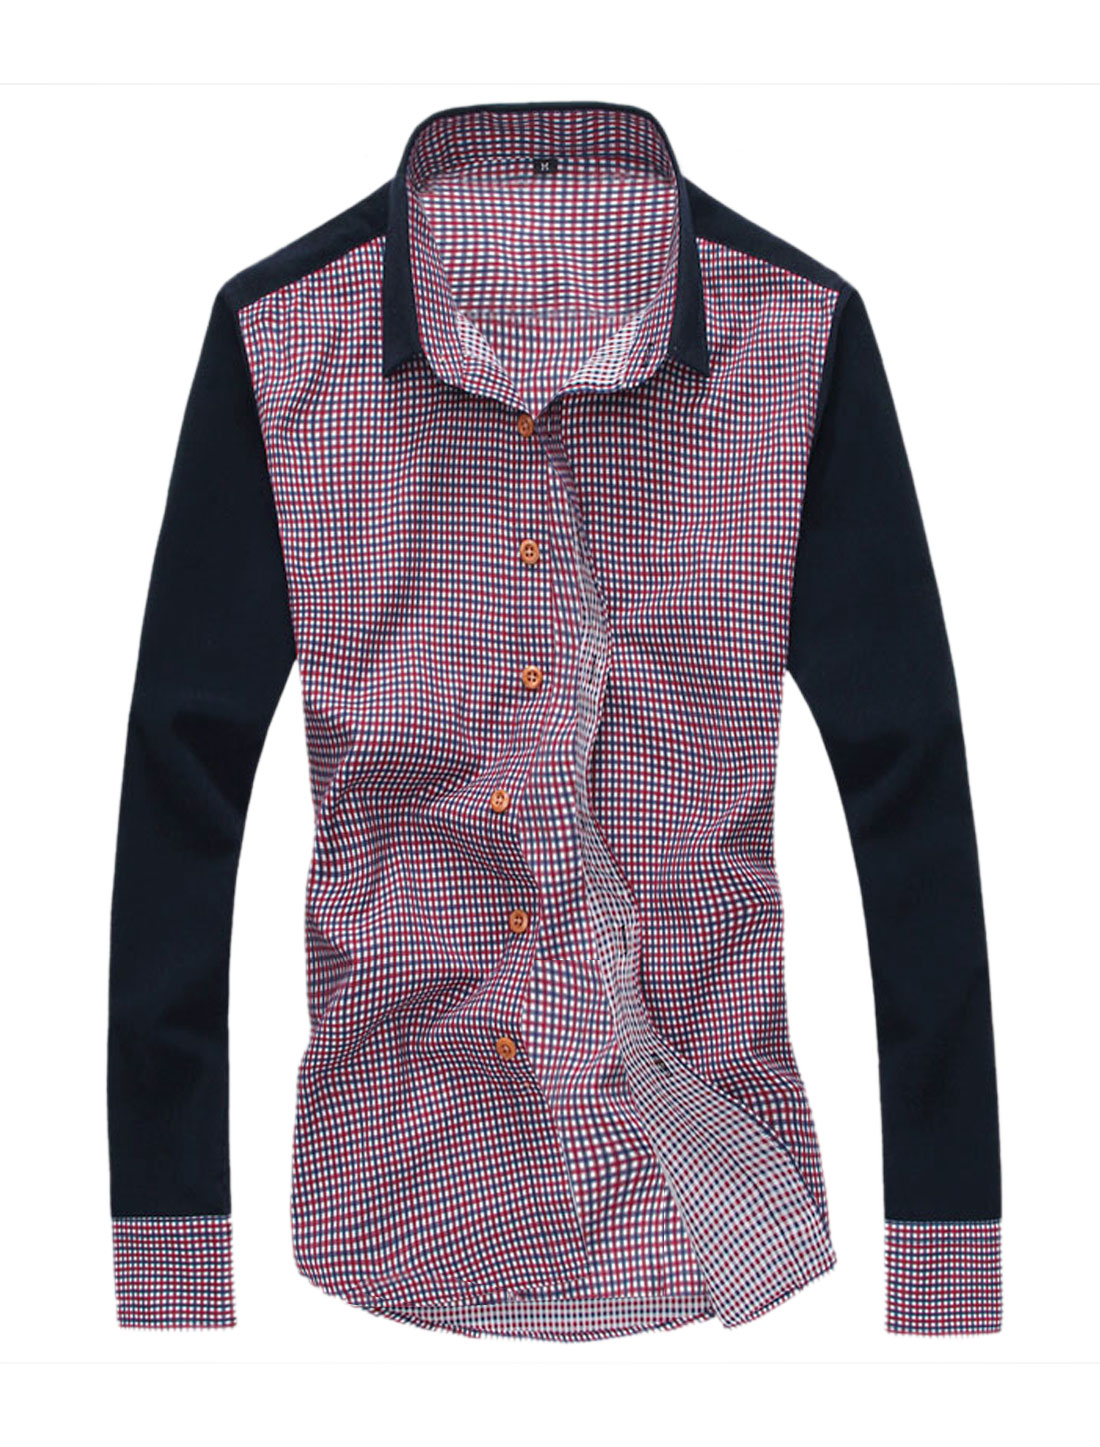 Men Plaids Contrast Color One Chest Pocket Shirt Burgundy Dark Blue M